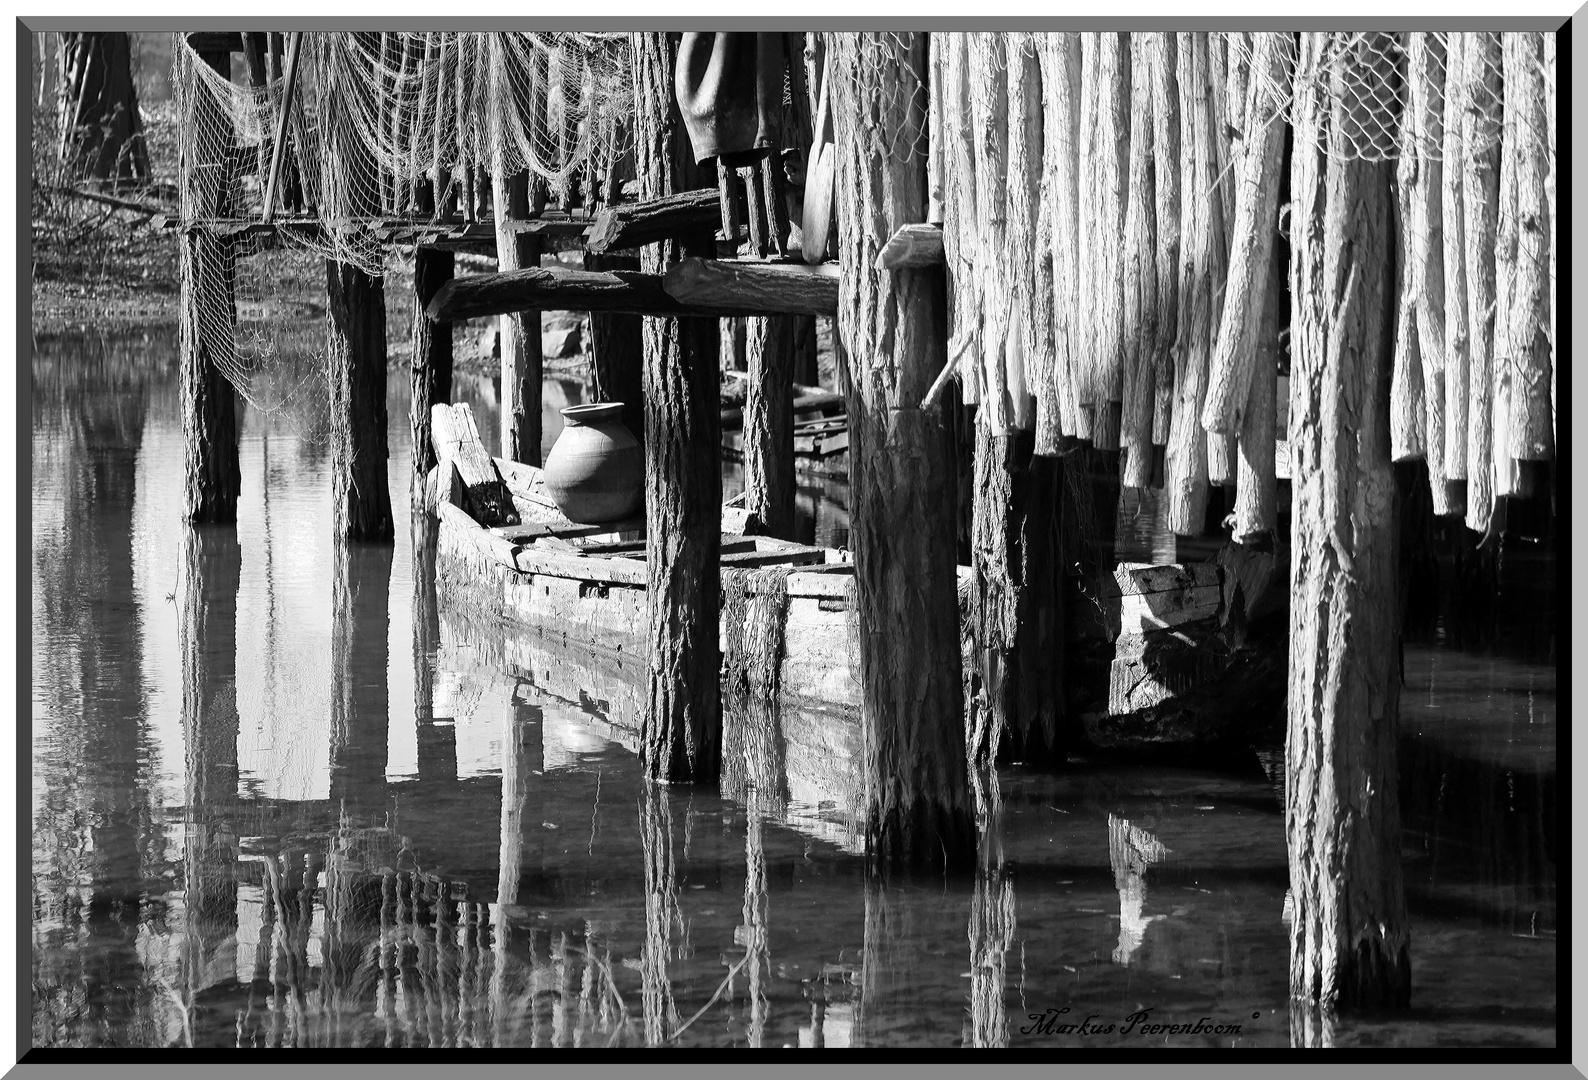 Pfahlhütte mit Kanu